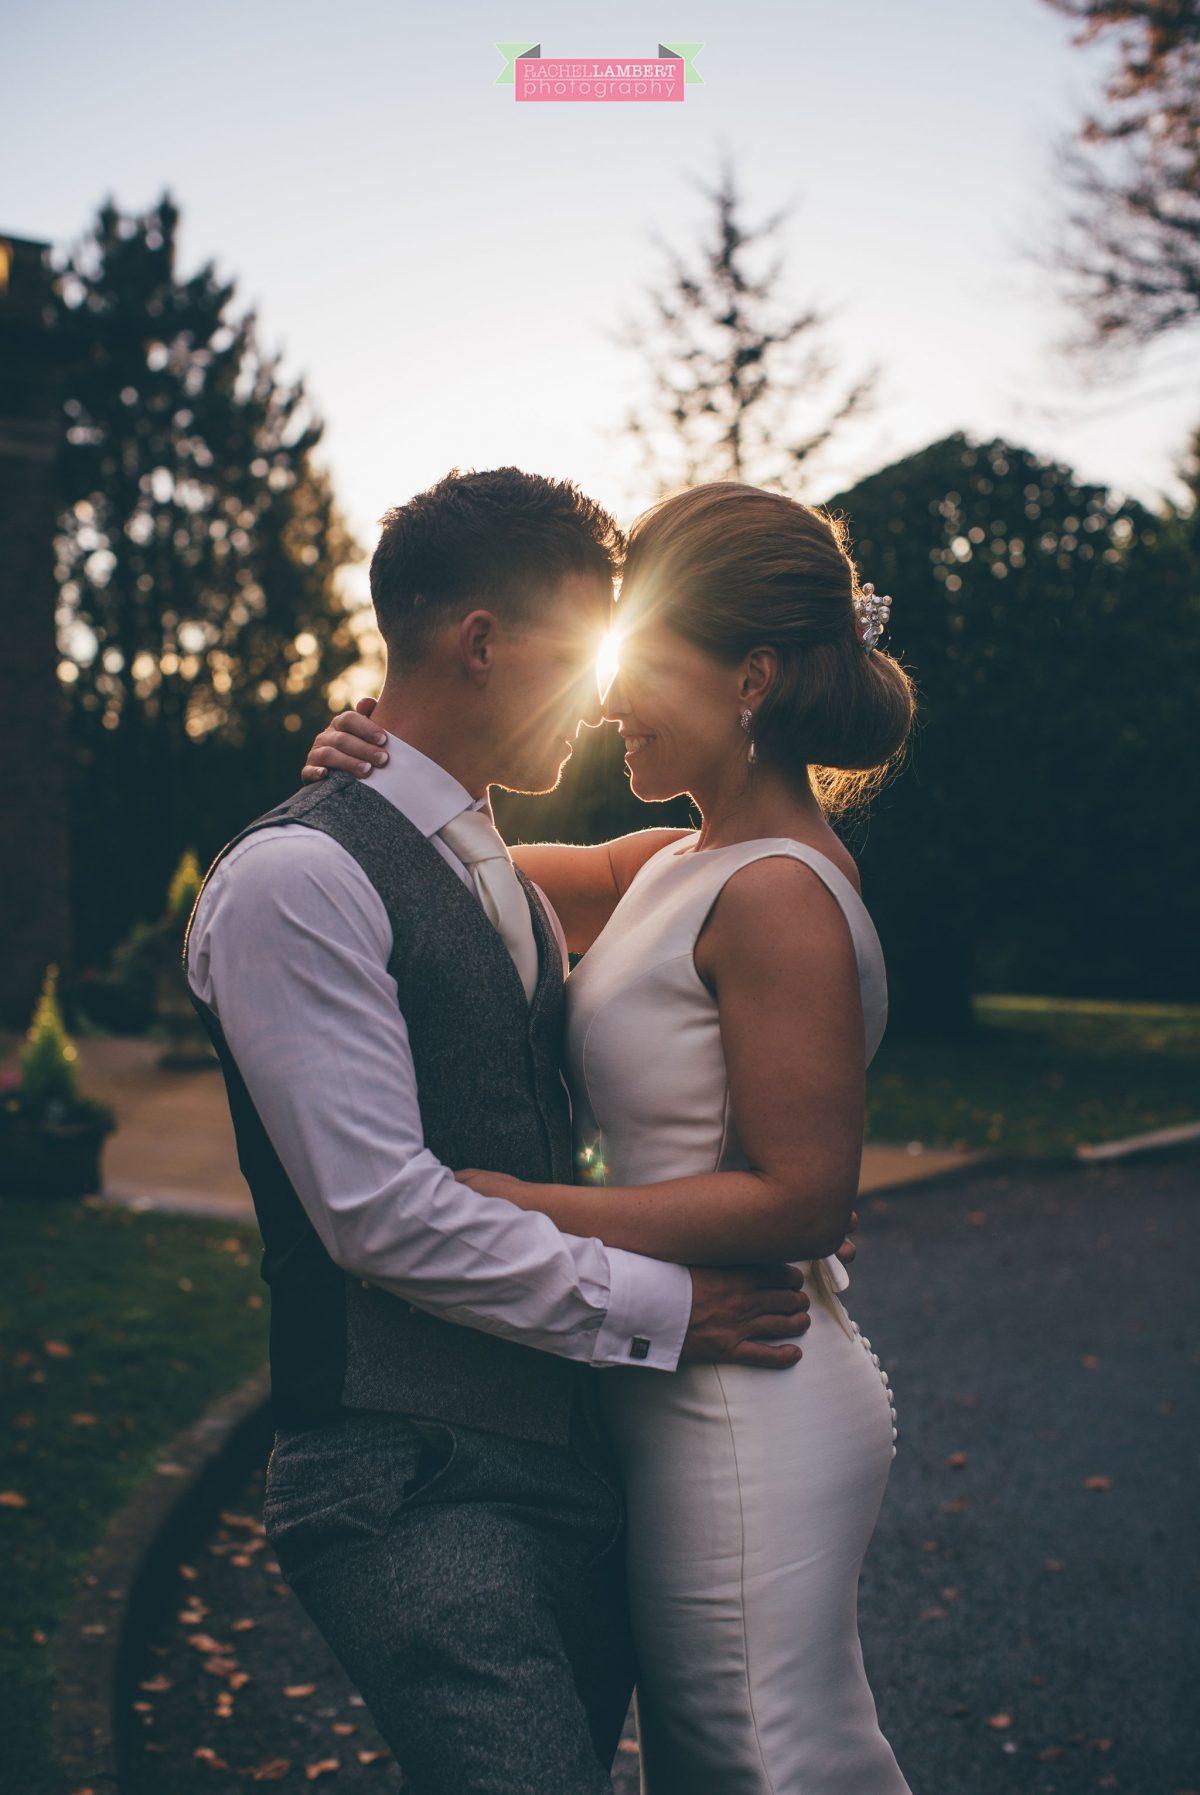 welsh_wedding_photographer_rachel_lambert_photography_decourceys_manor_cardiff_ceri_chris_ 39